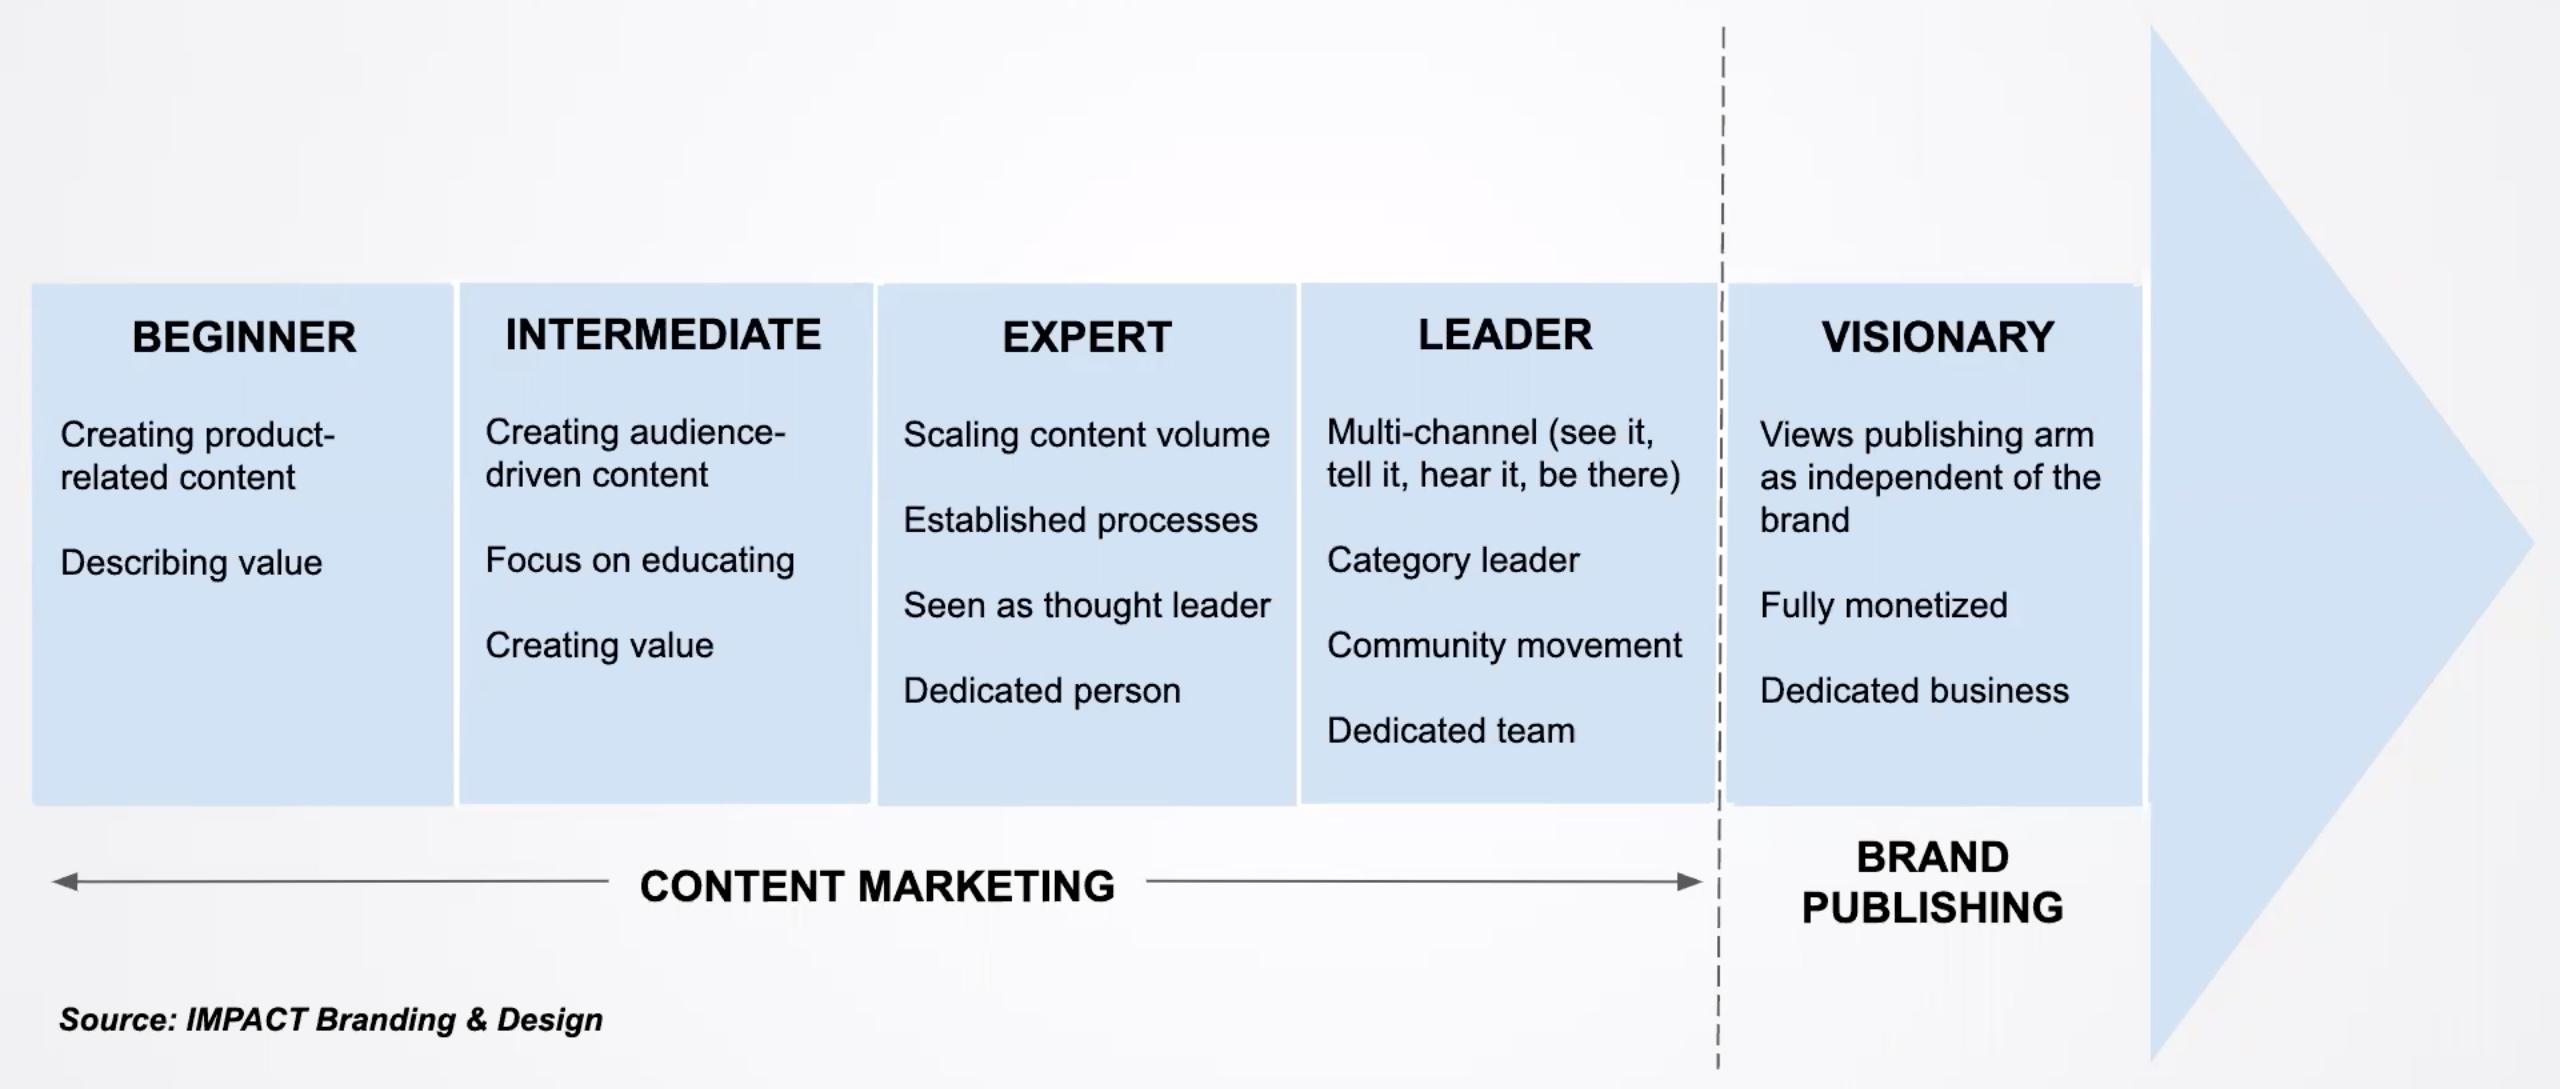 content-marketing-vision